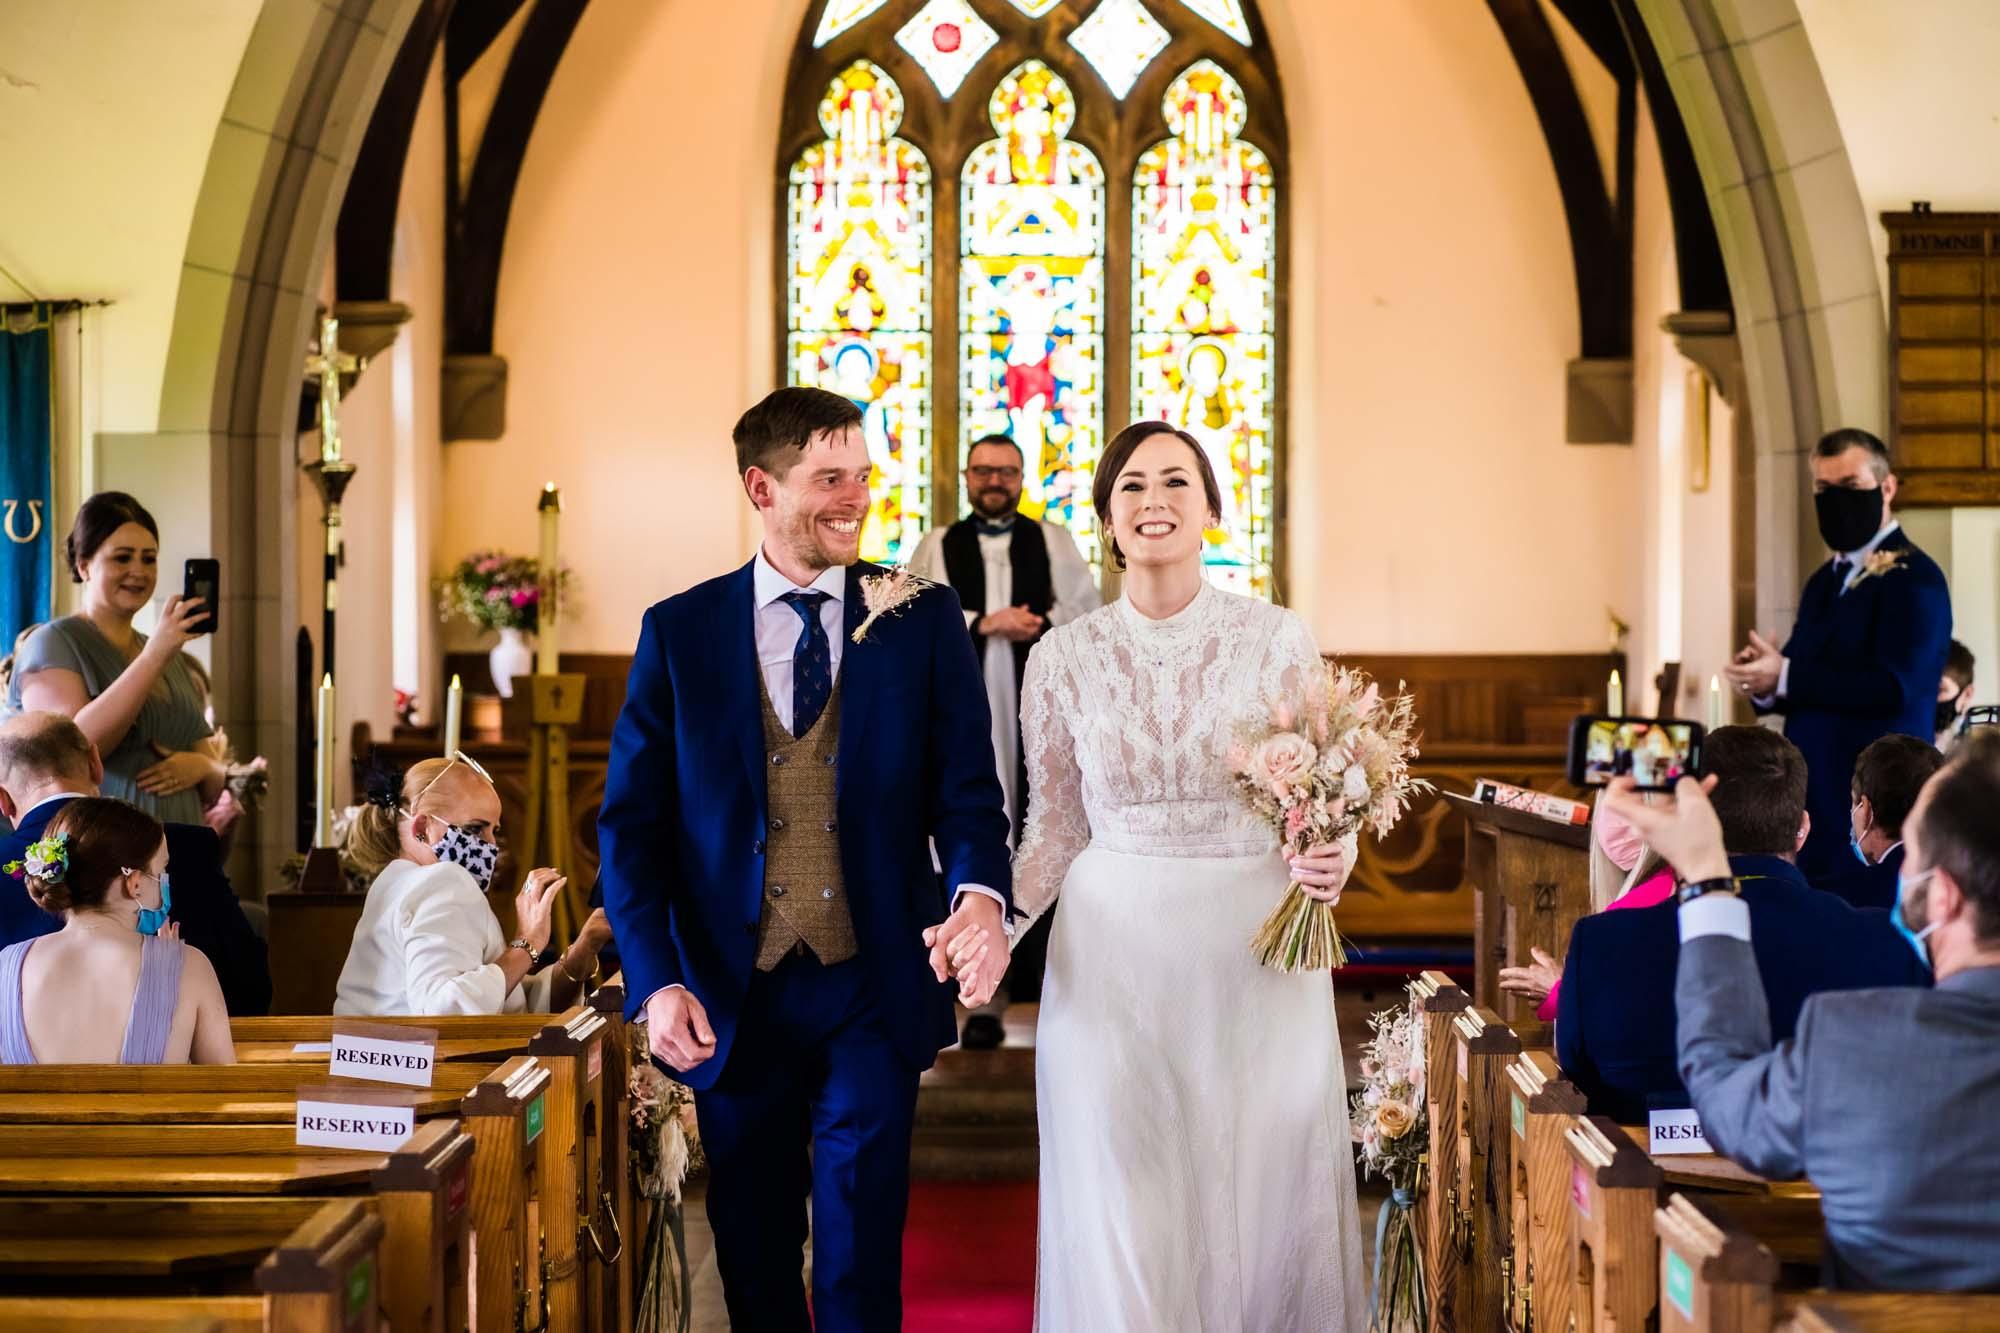 St Marks Dunham Massey Wedding Photographer